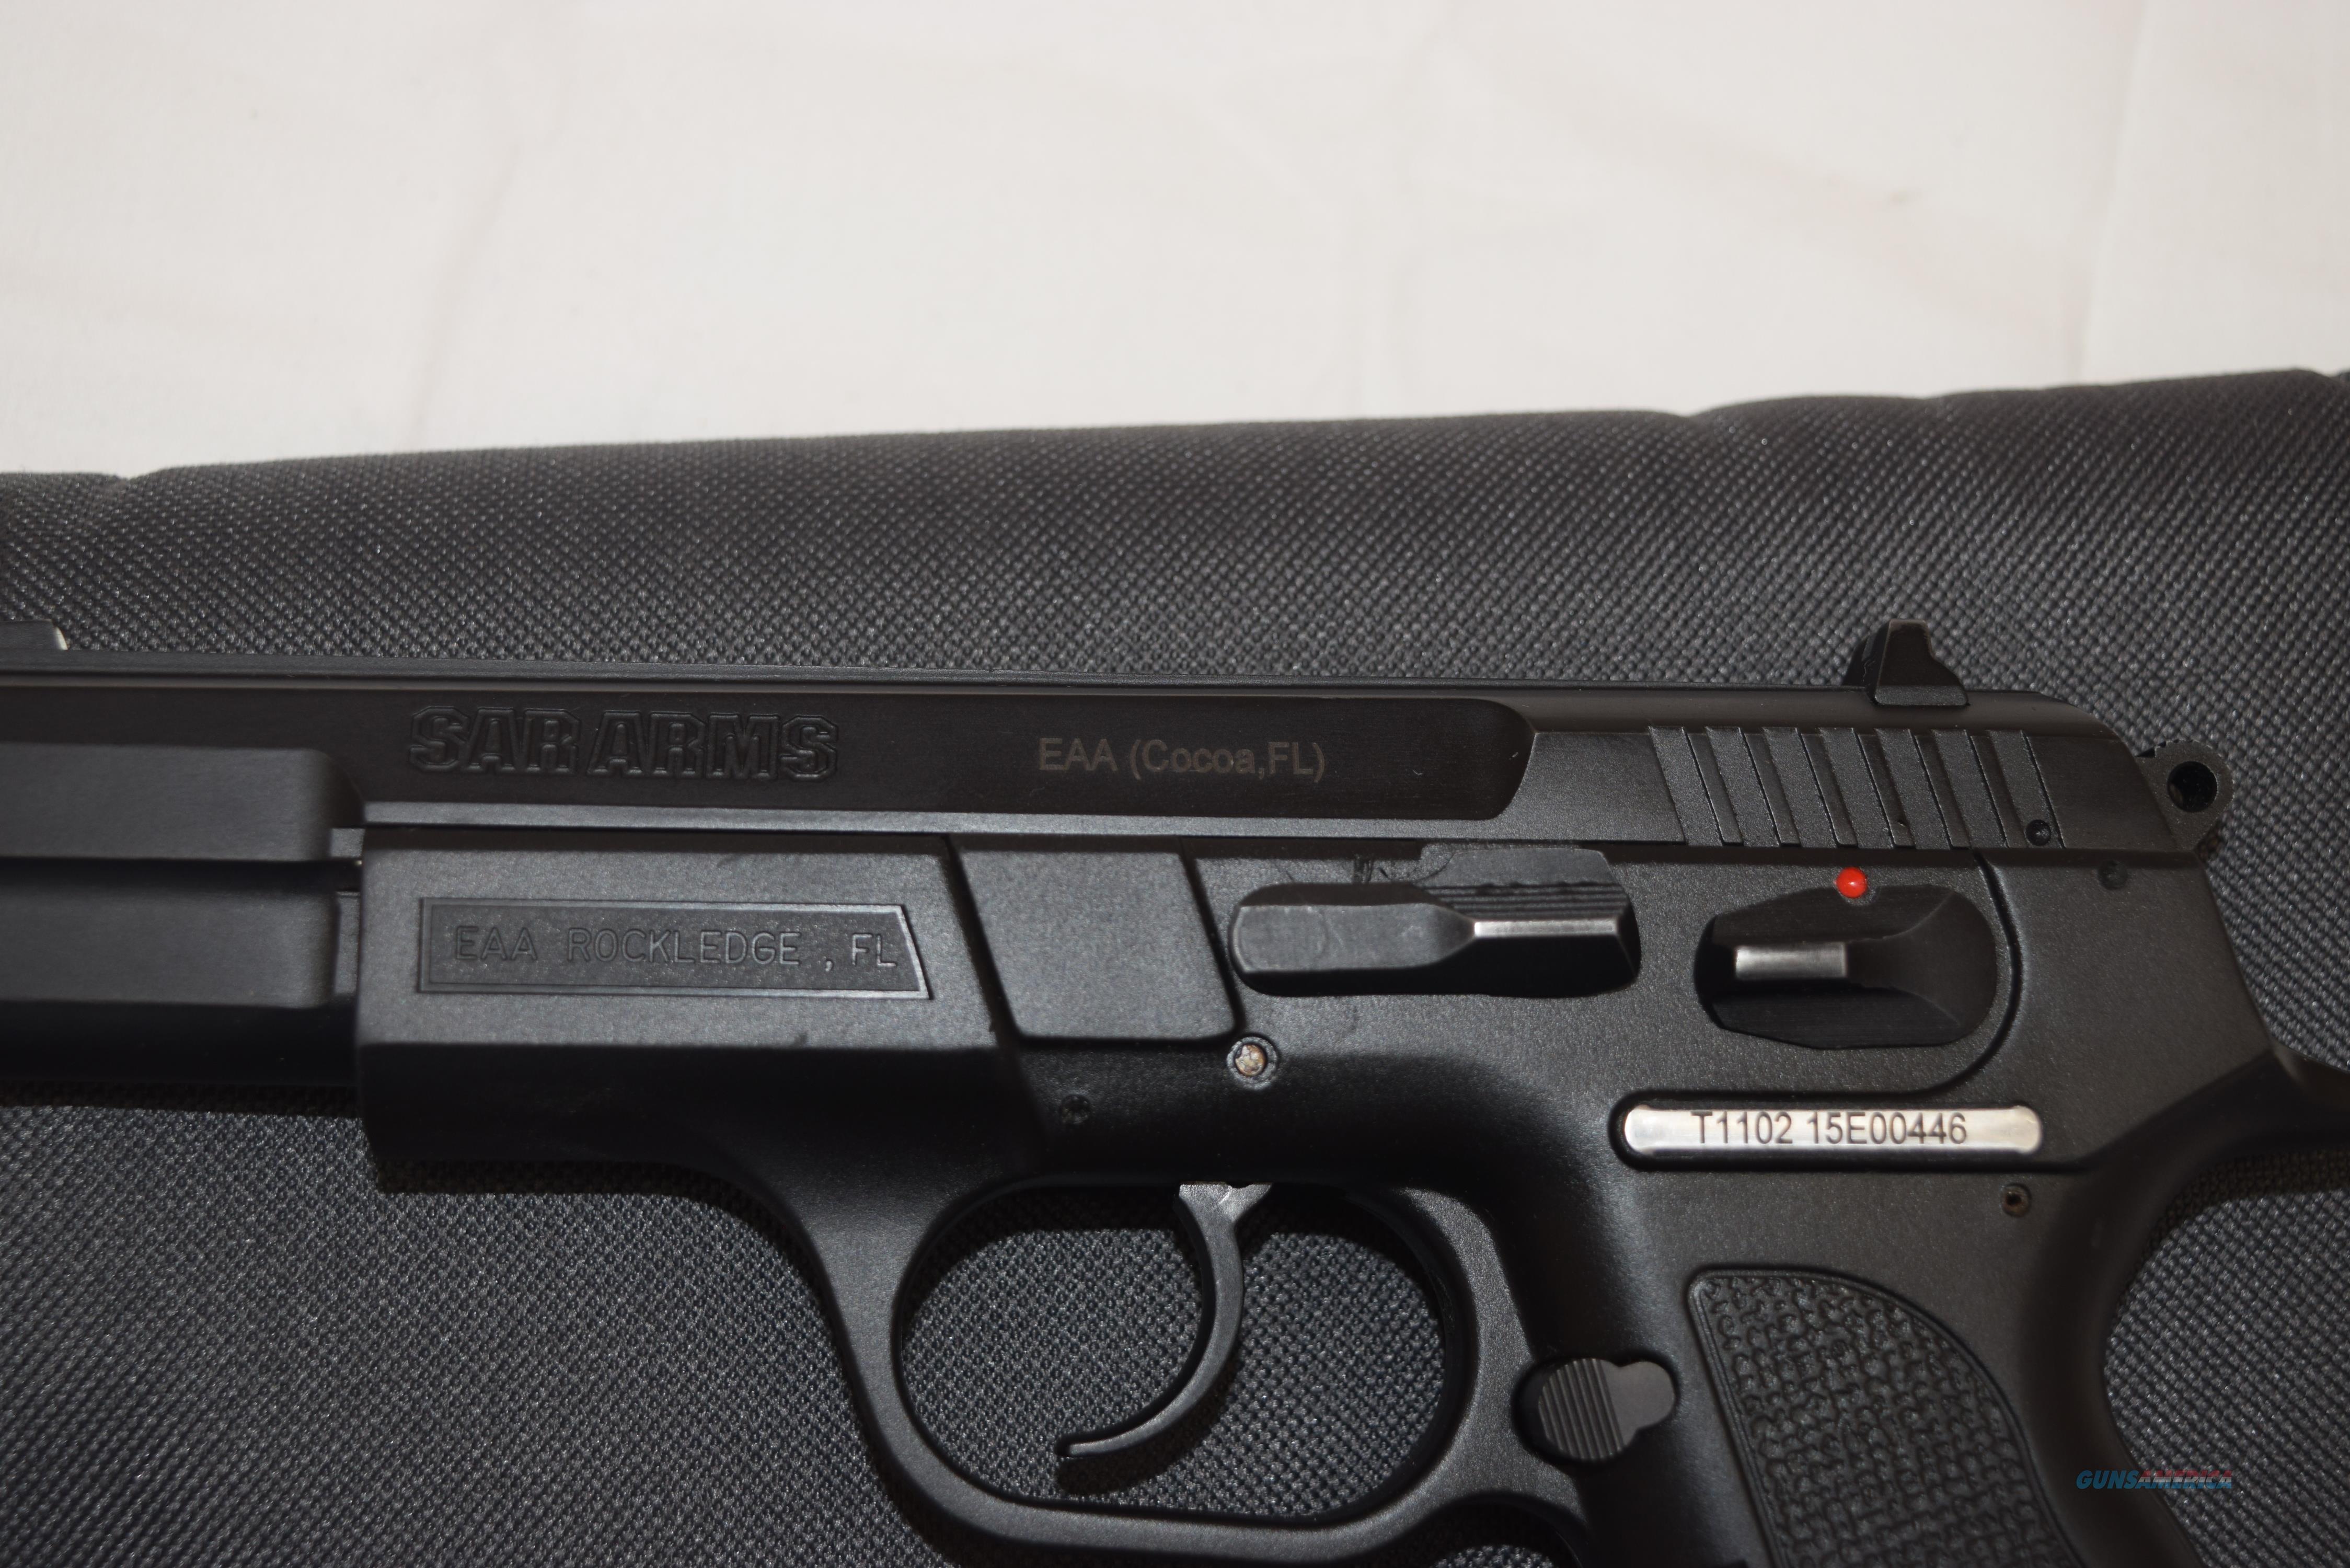 Sar Arms EAA SAR B6P 9mm Semiauto Pistol